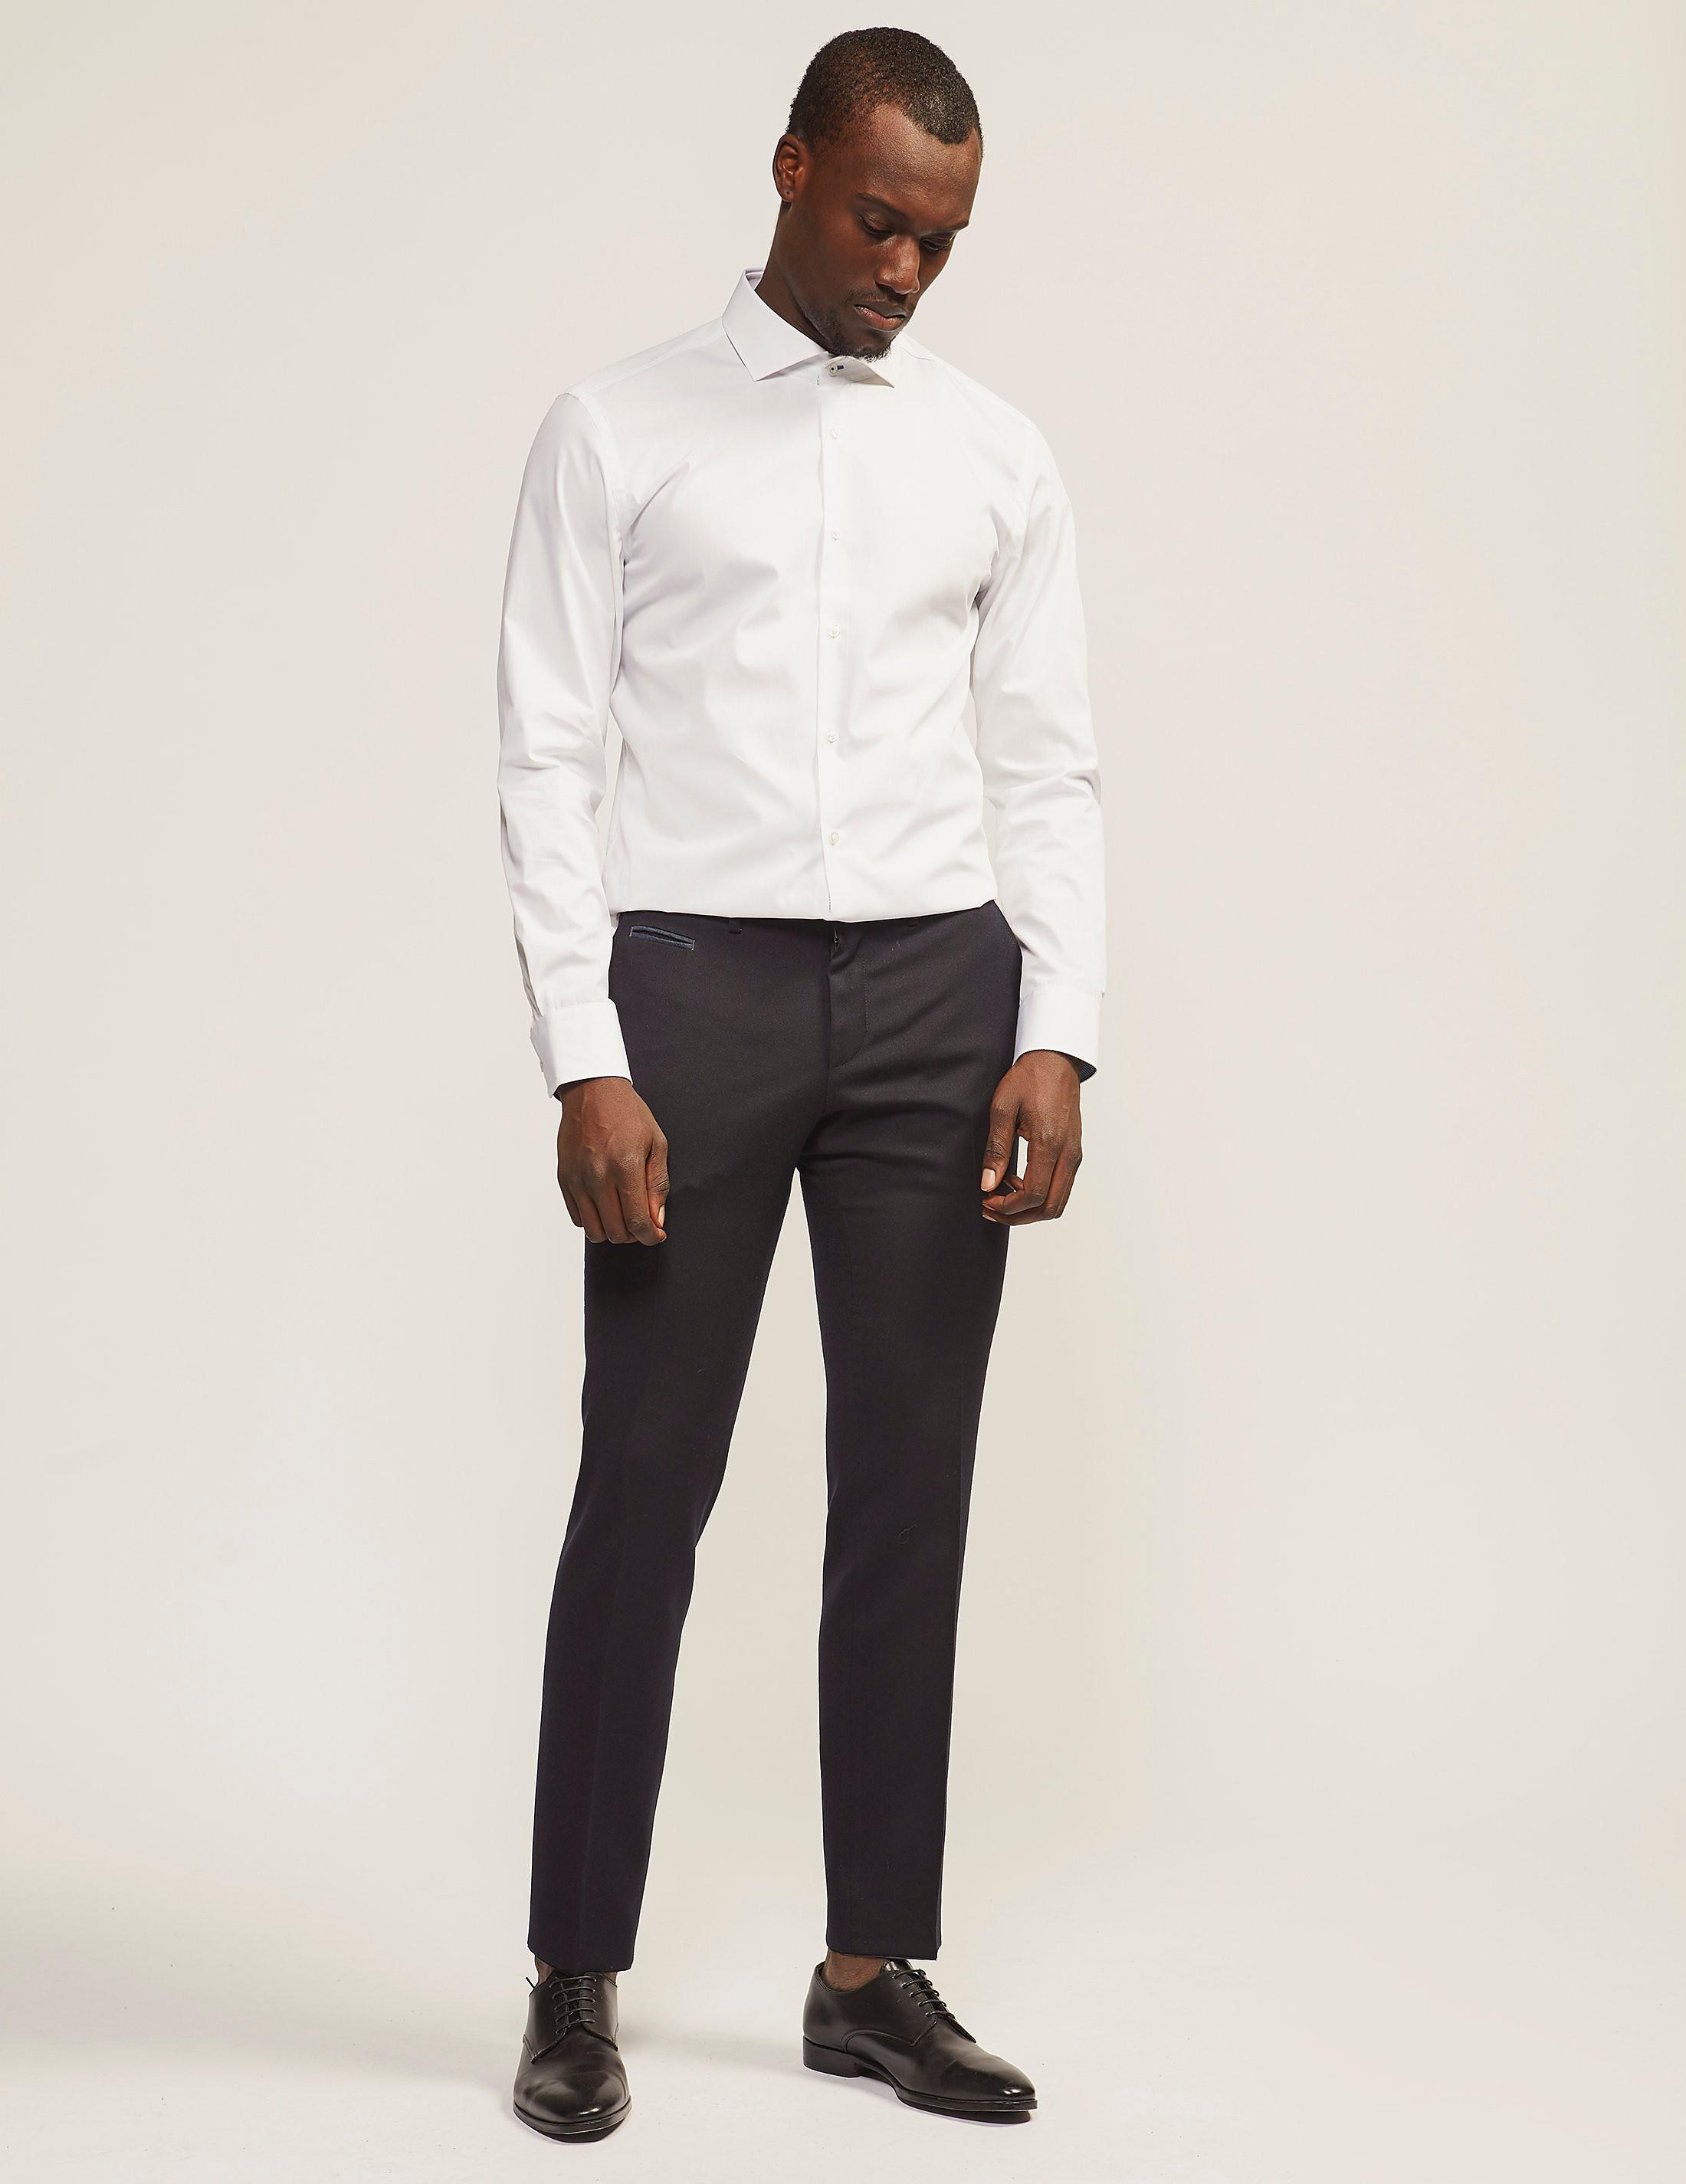 BOSS Jerry Slim Fit Shirt